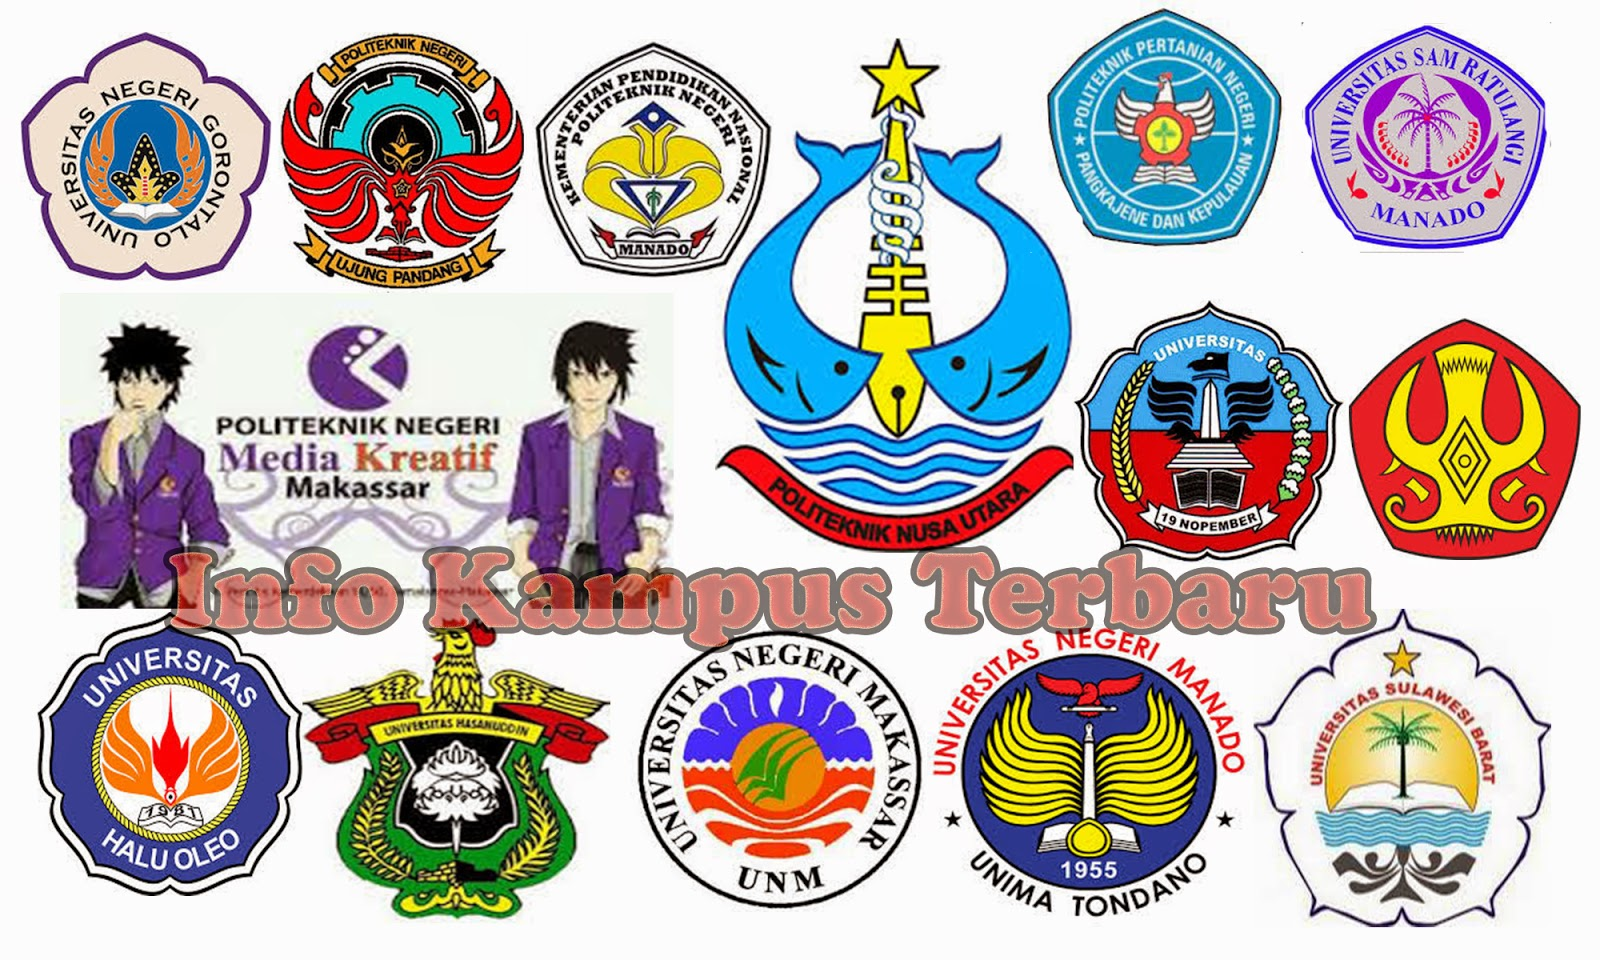 Daftar Perguruan Tinggi Negeri Di Sulawesi